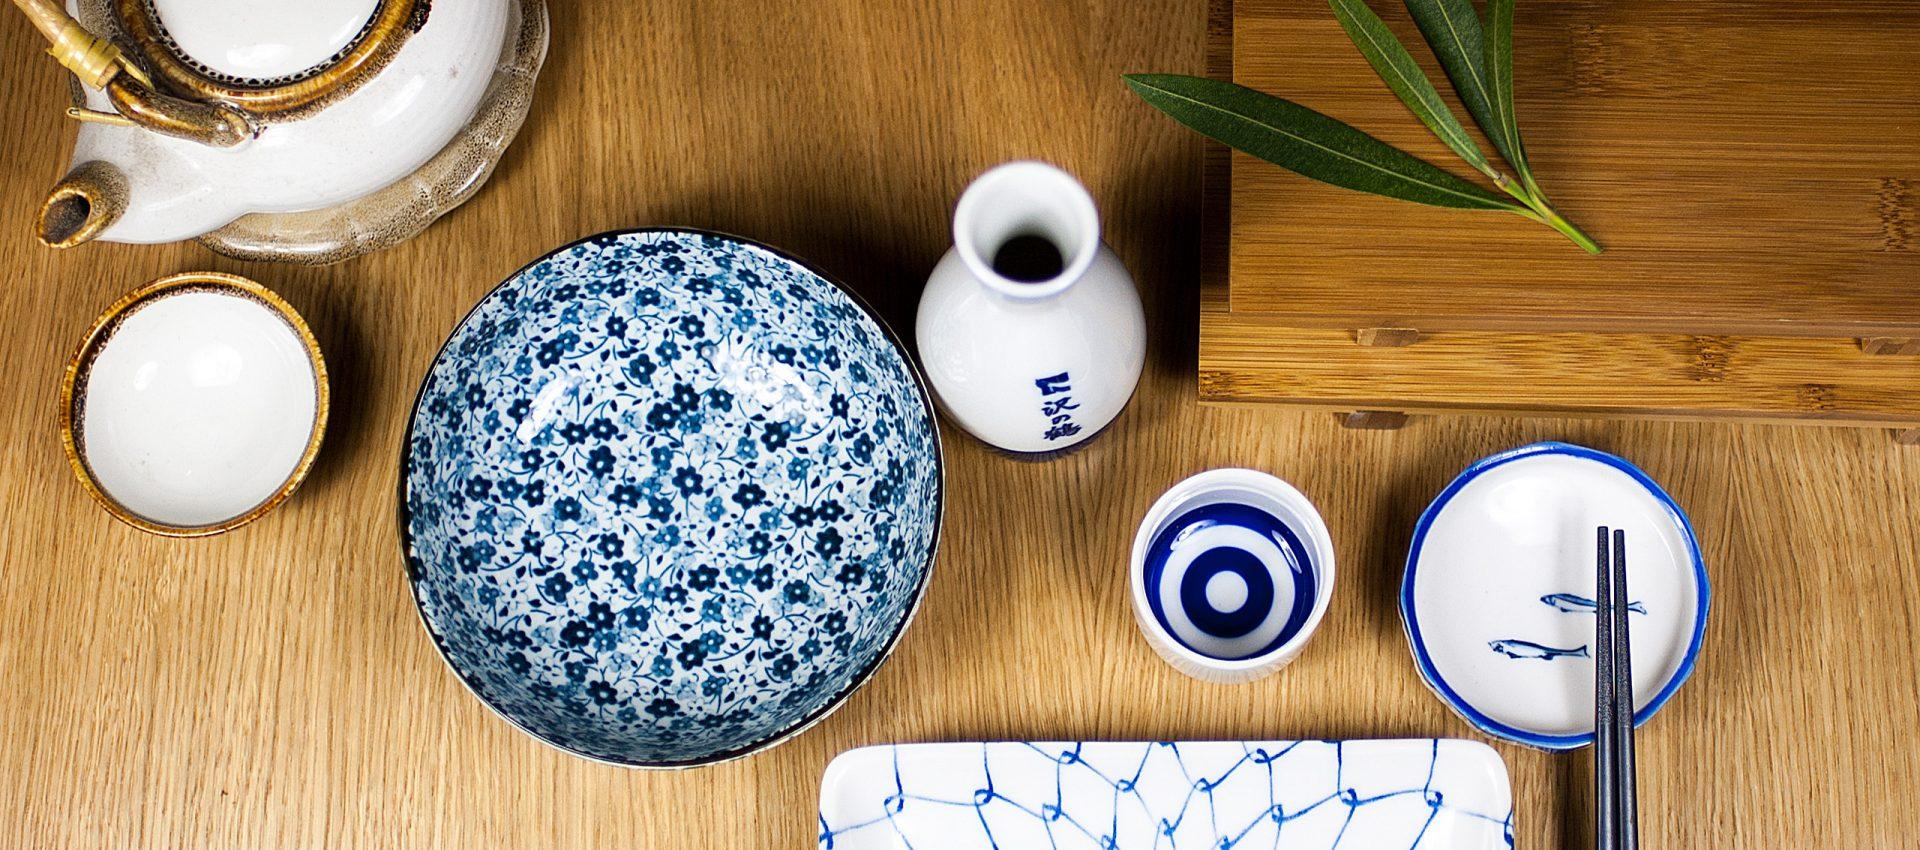 Japanische Tischsitten